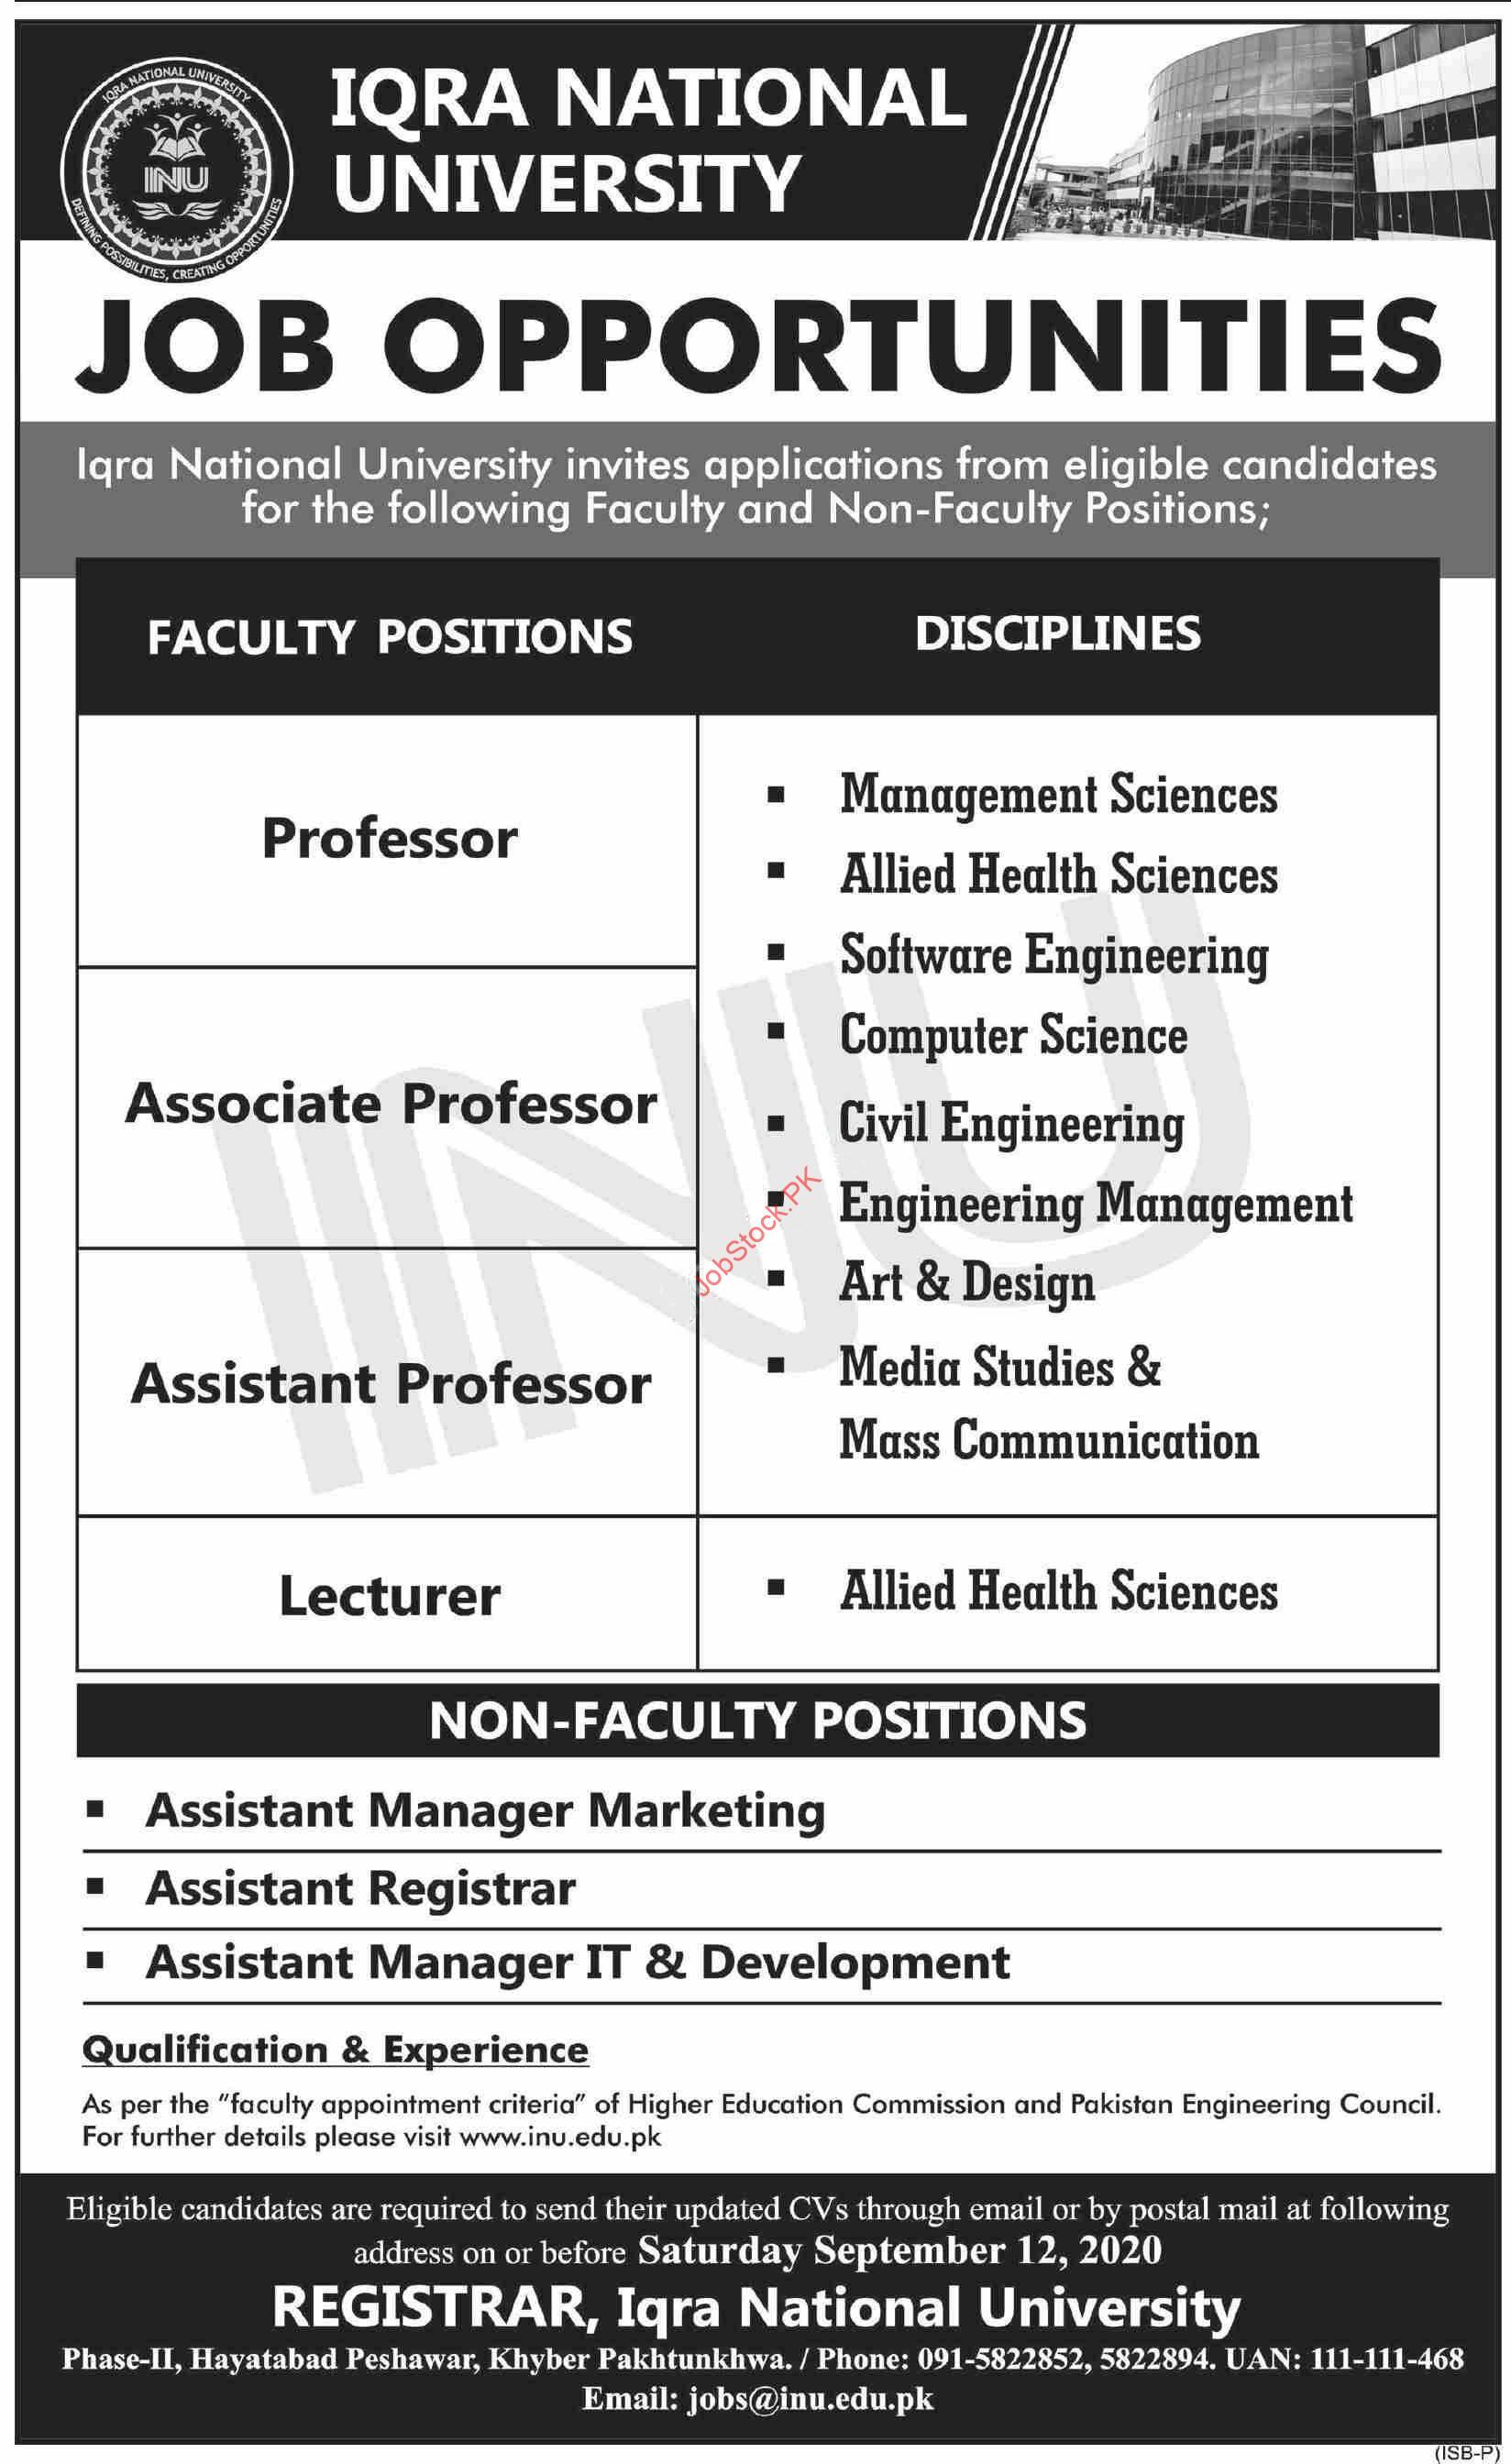 Iqra National University Inu Peshawar Jobs 2020